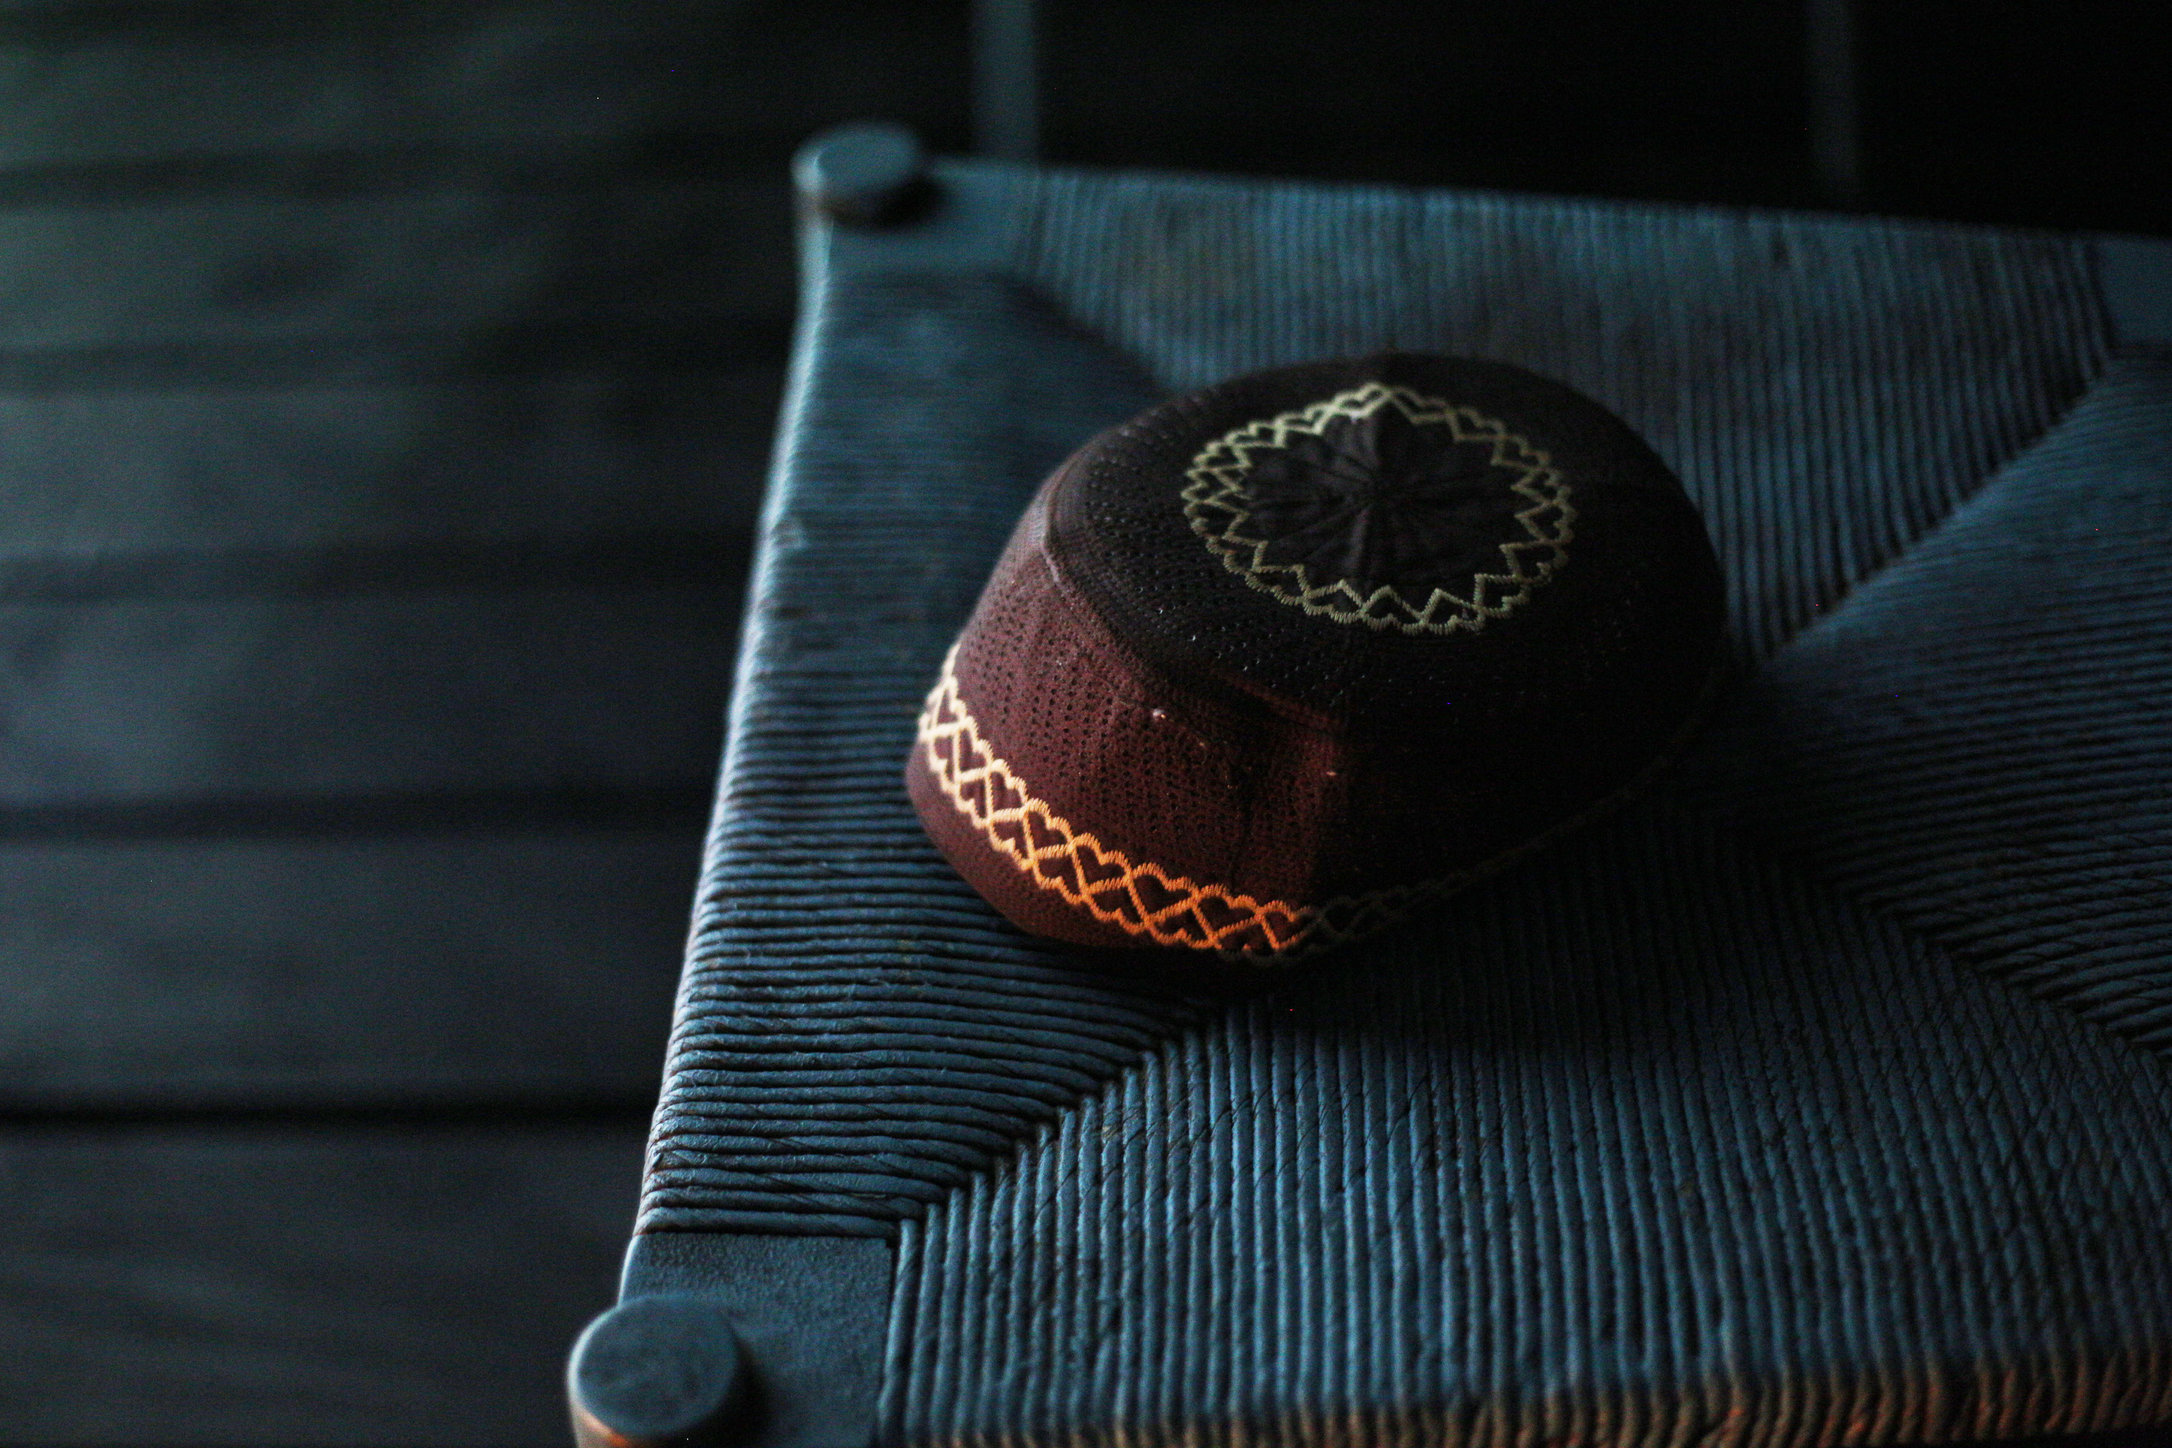 hat on chair thumbprint.jpg